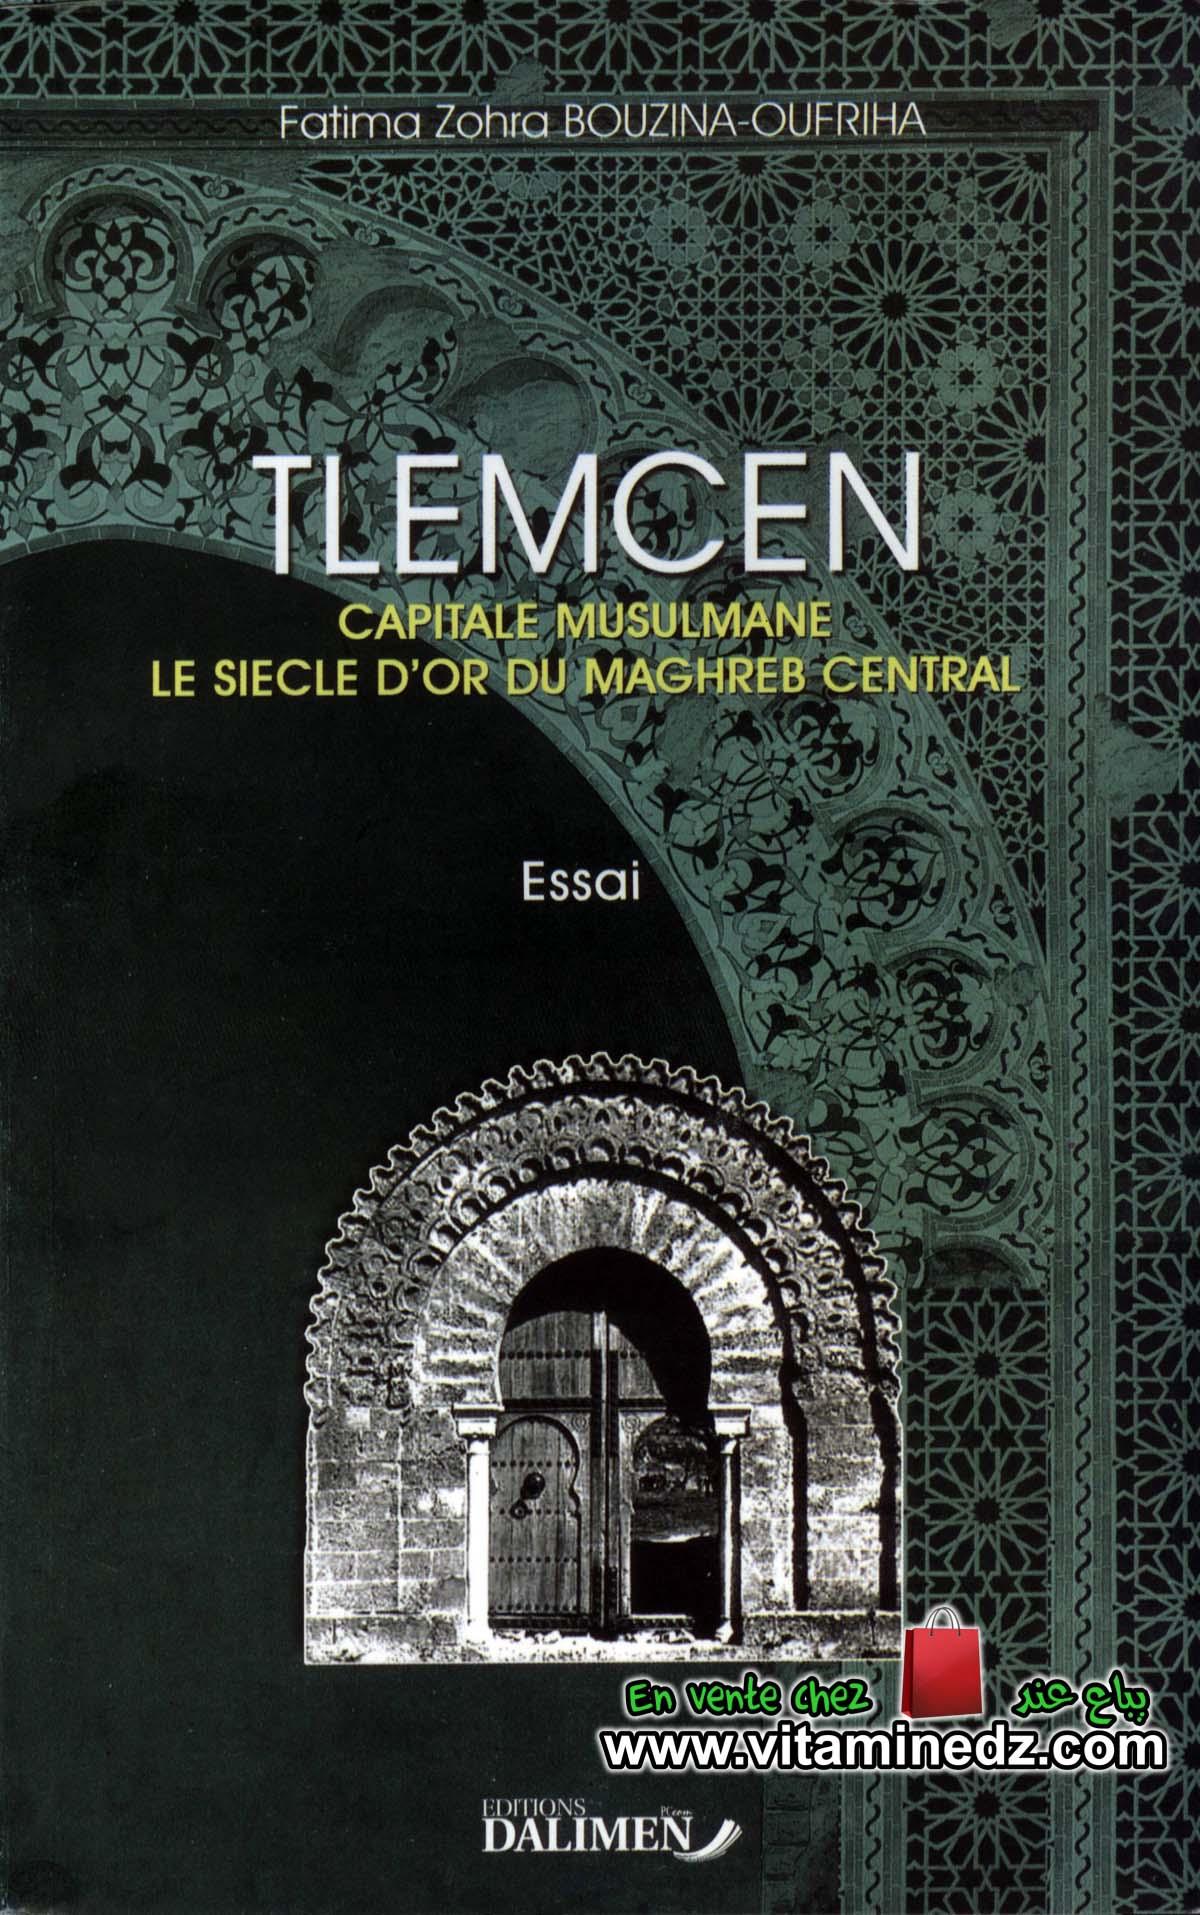 Fatima Zohra Bouzina-Oufriha - Tlemcen, Capitale Musulmane: Le Siècle d'Or du Maghreb Central